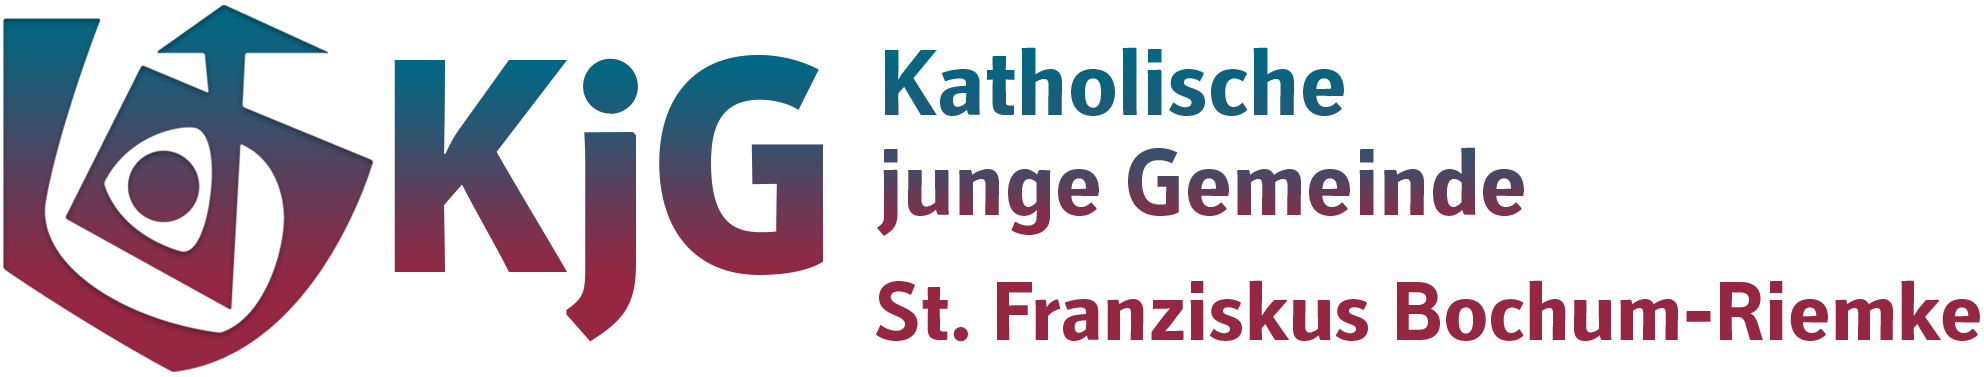 KjG St. Franziskus Bochum-Riemke